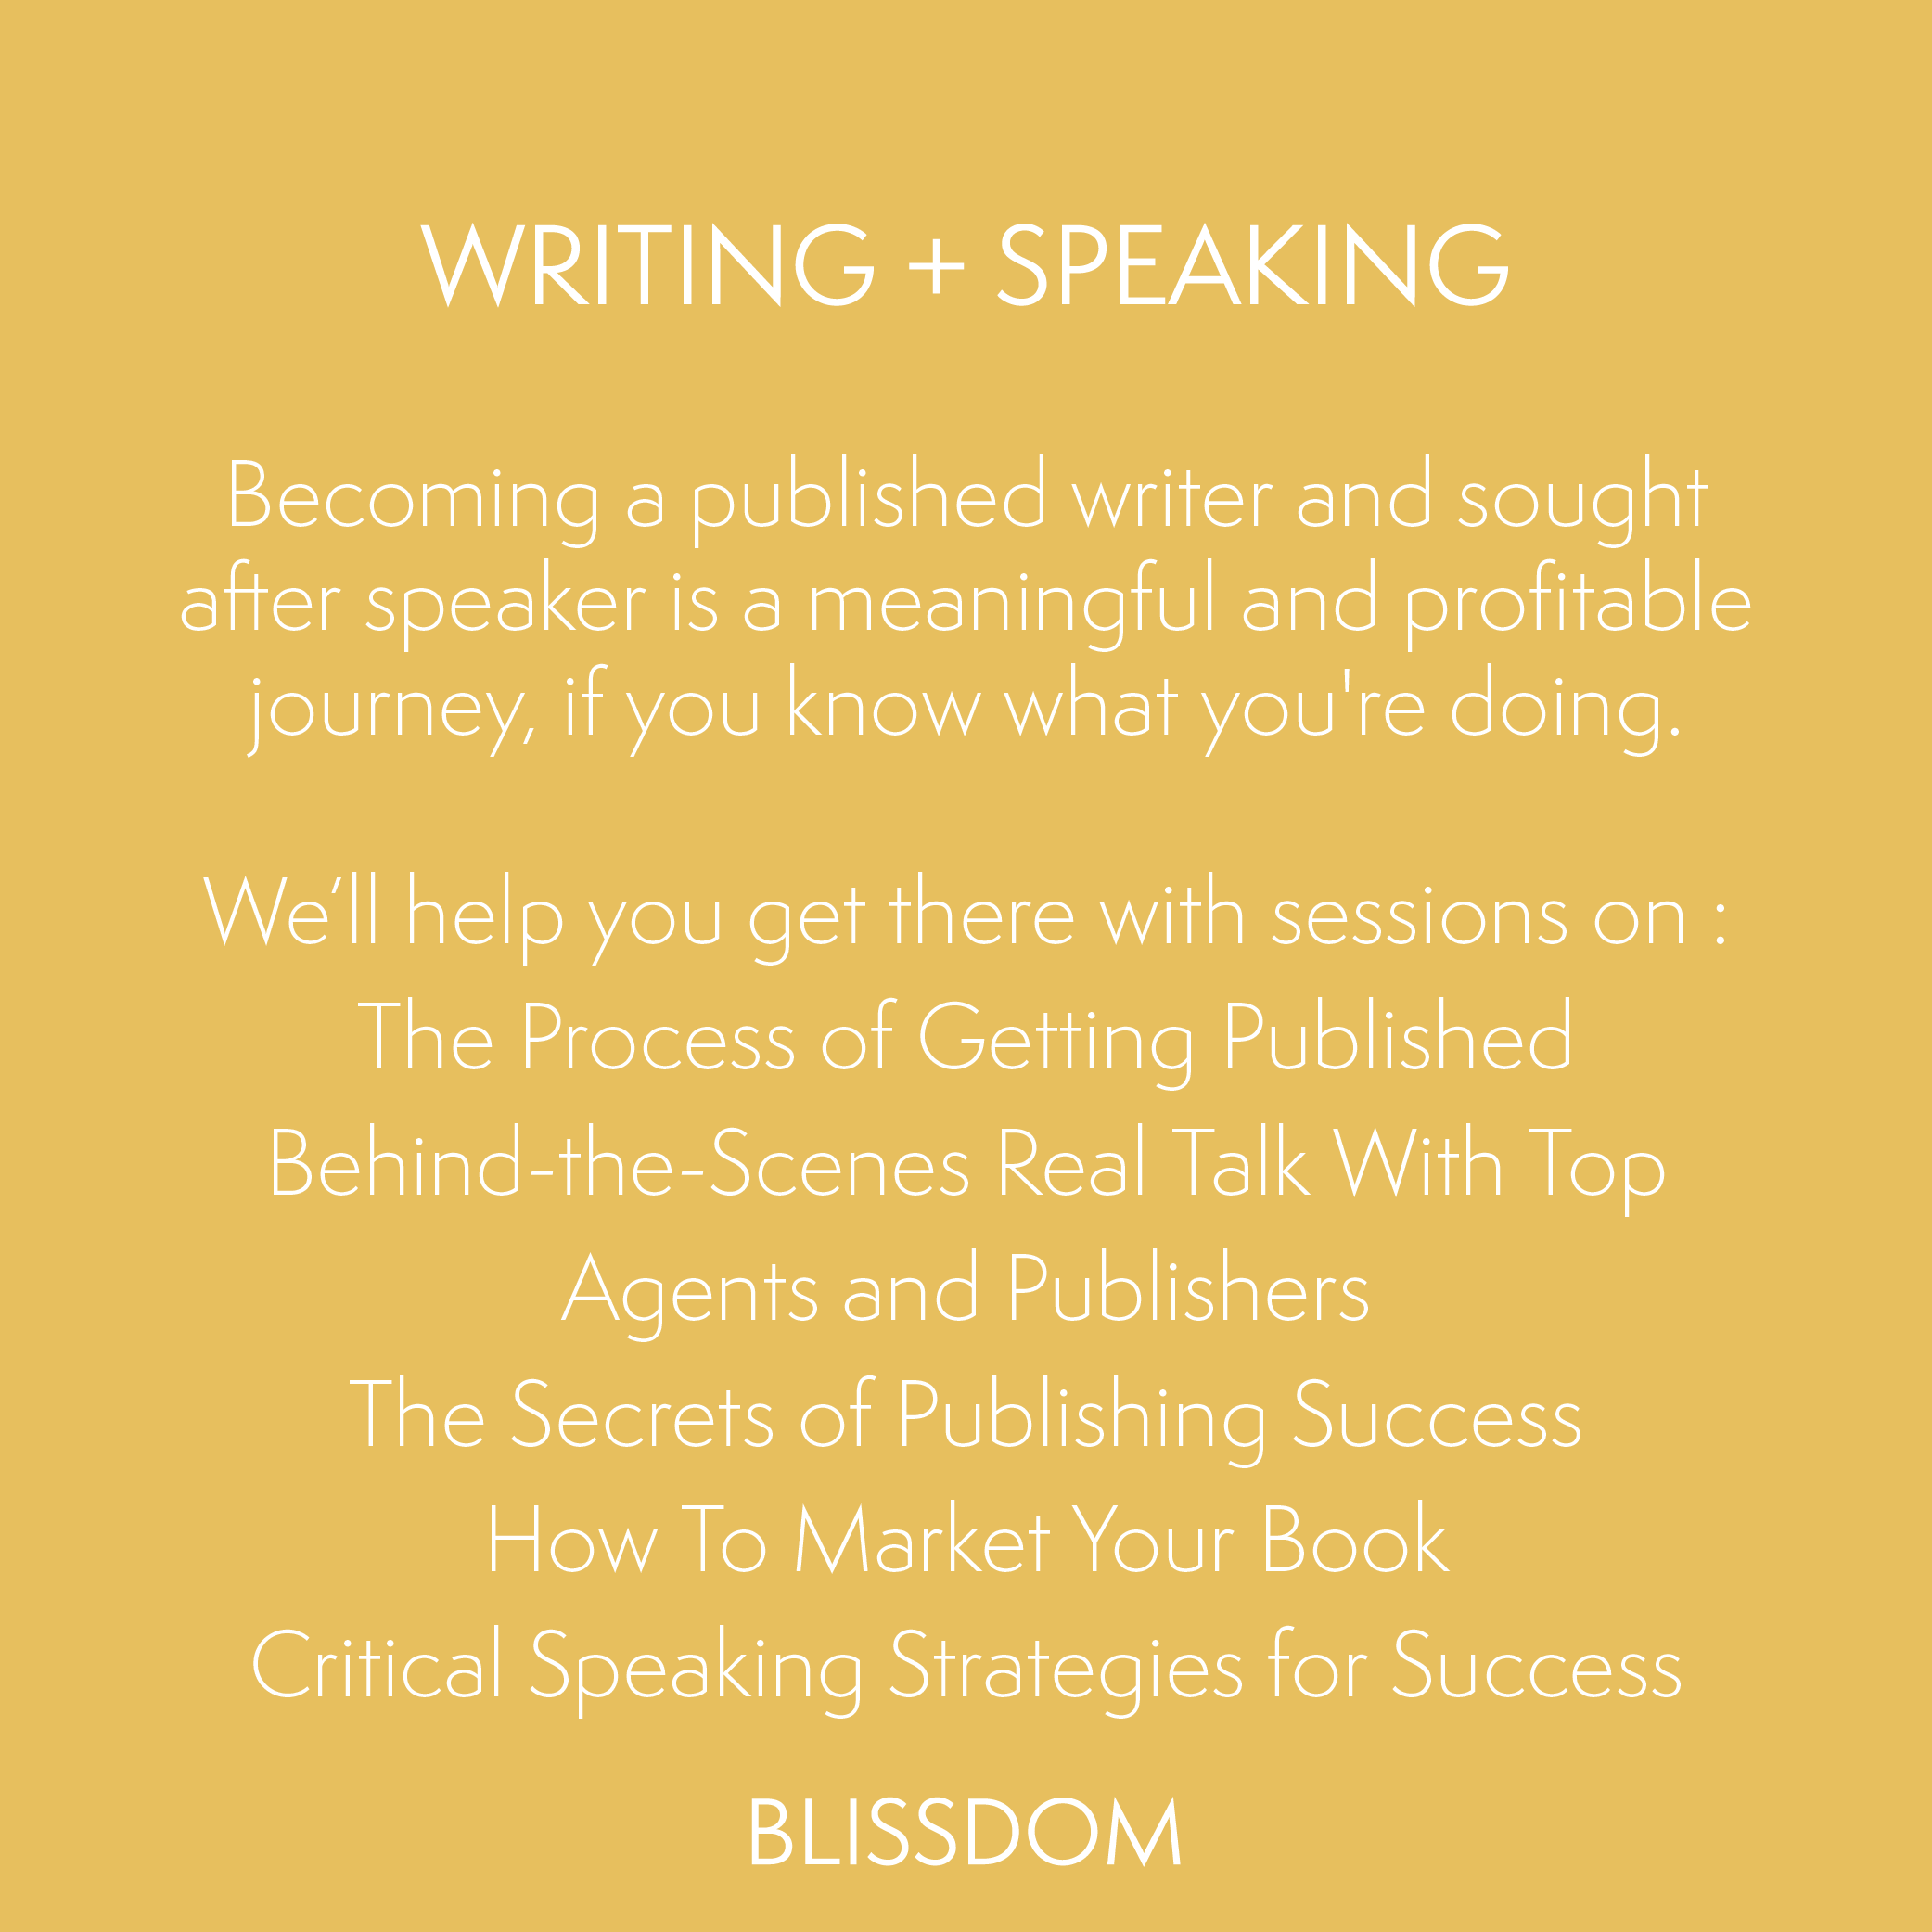 Writing-Speaking-Blissdom-Track